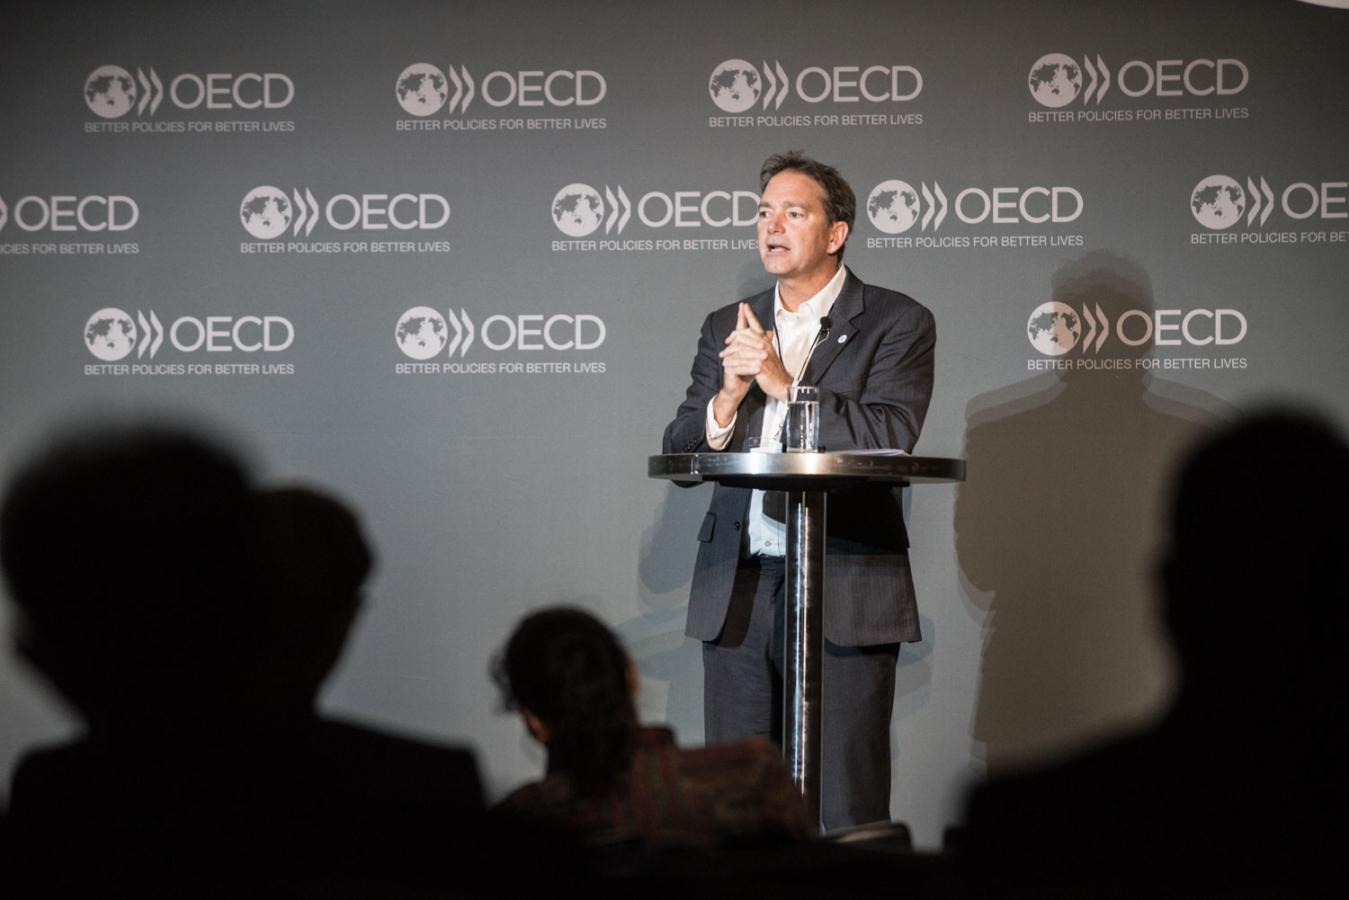 6 June 2017 - OCDE-OECD Forum 2017: 15/15 Talk – Exponential Disruption. OECD, Paris, France.Nicholas Haan, Vice-President, Impact & Faculty Chair, Global Grand Challenges, Singularity UniversityWith Shiv Malik, Author & JournalistPhoto: OECD/Hubert Raguet